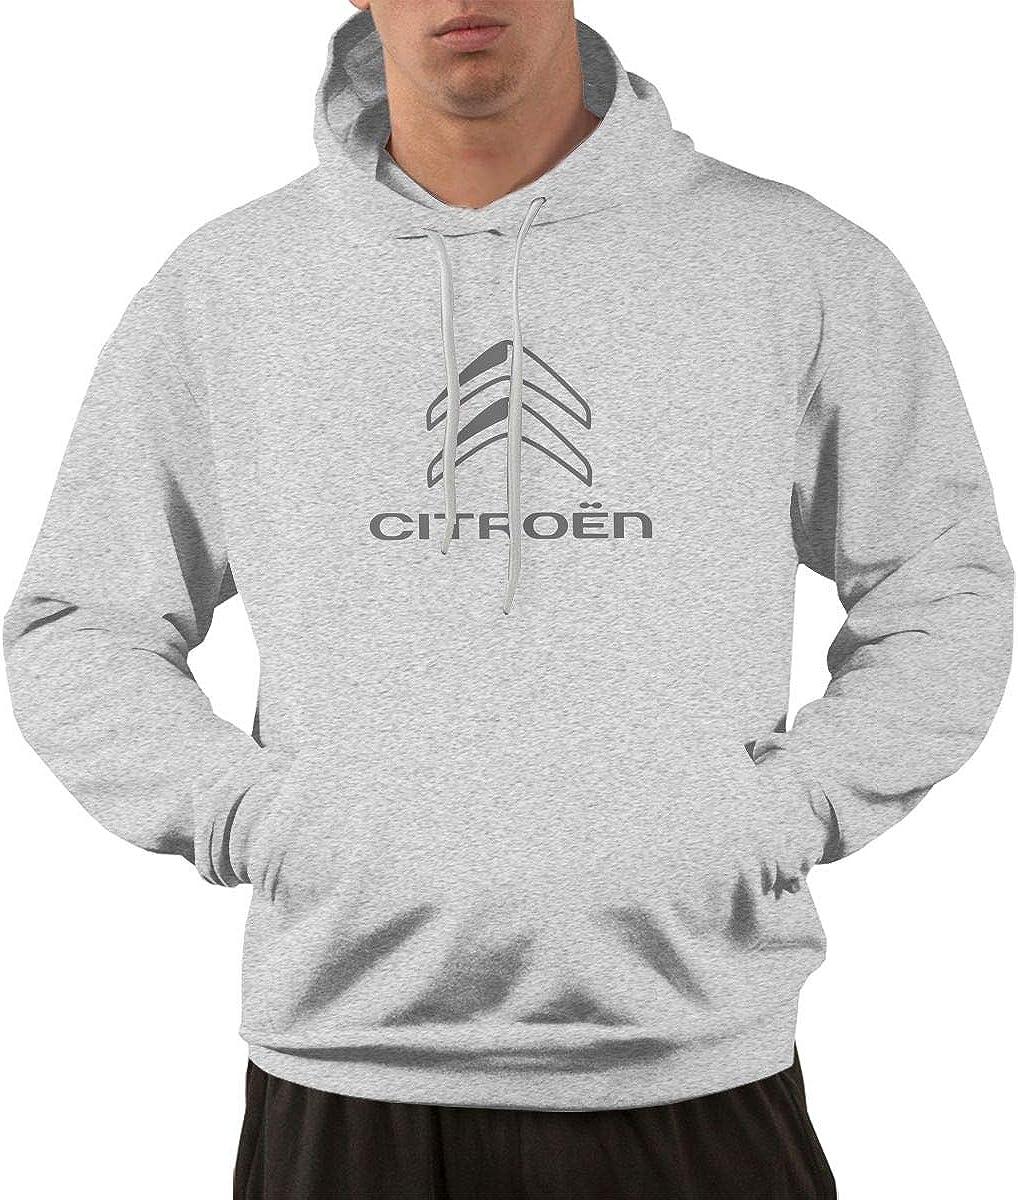 Hengteng Men Casual Citroen Motors Logo Hoodies Black